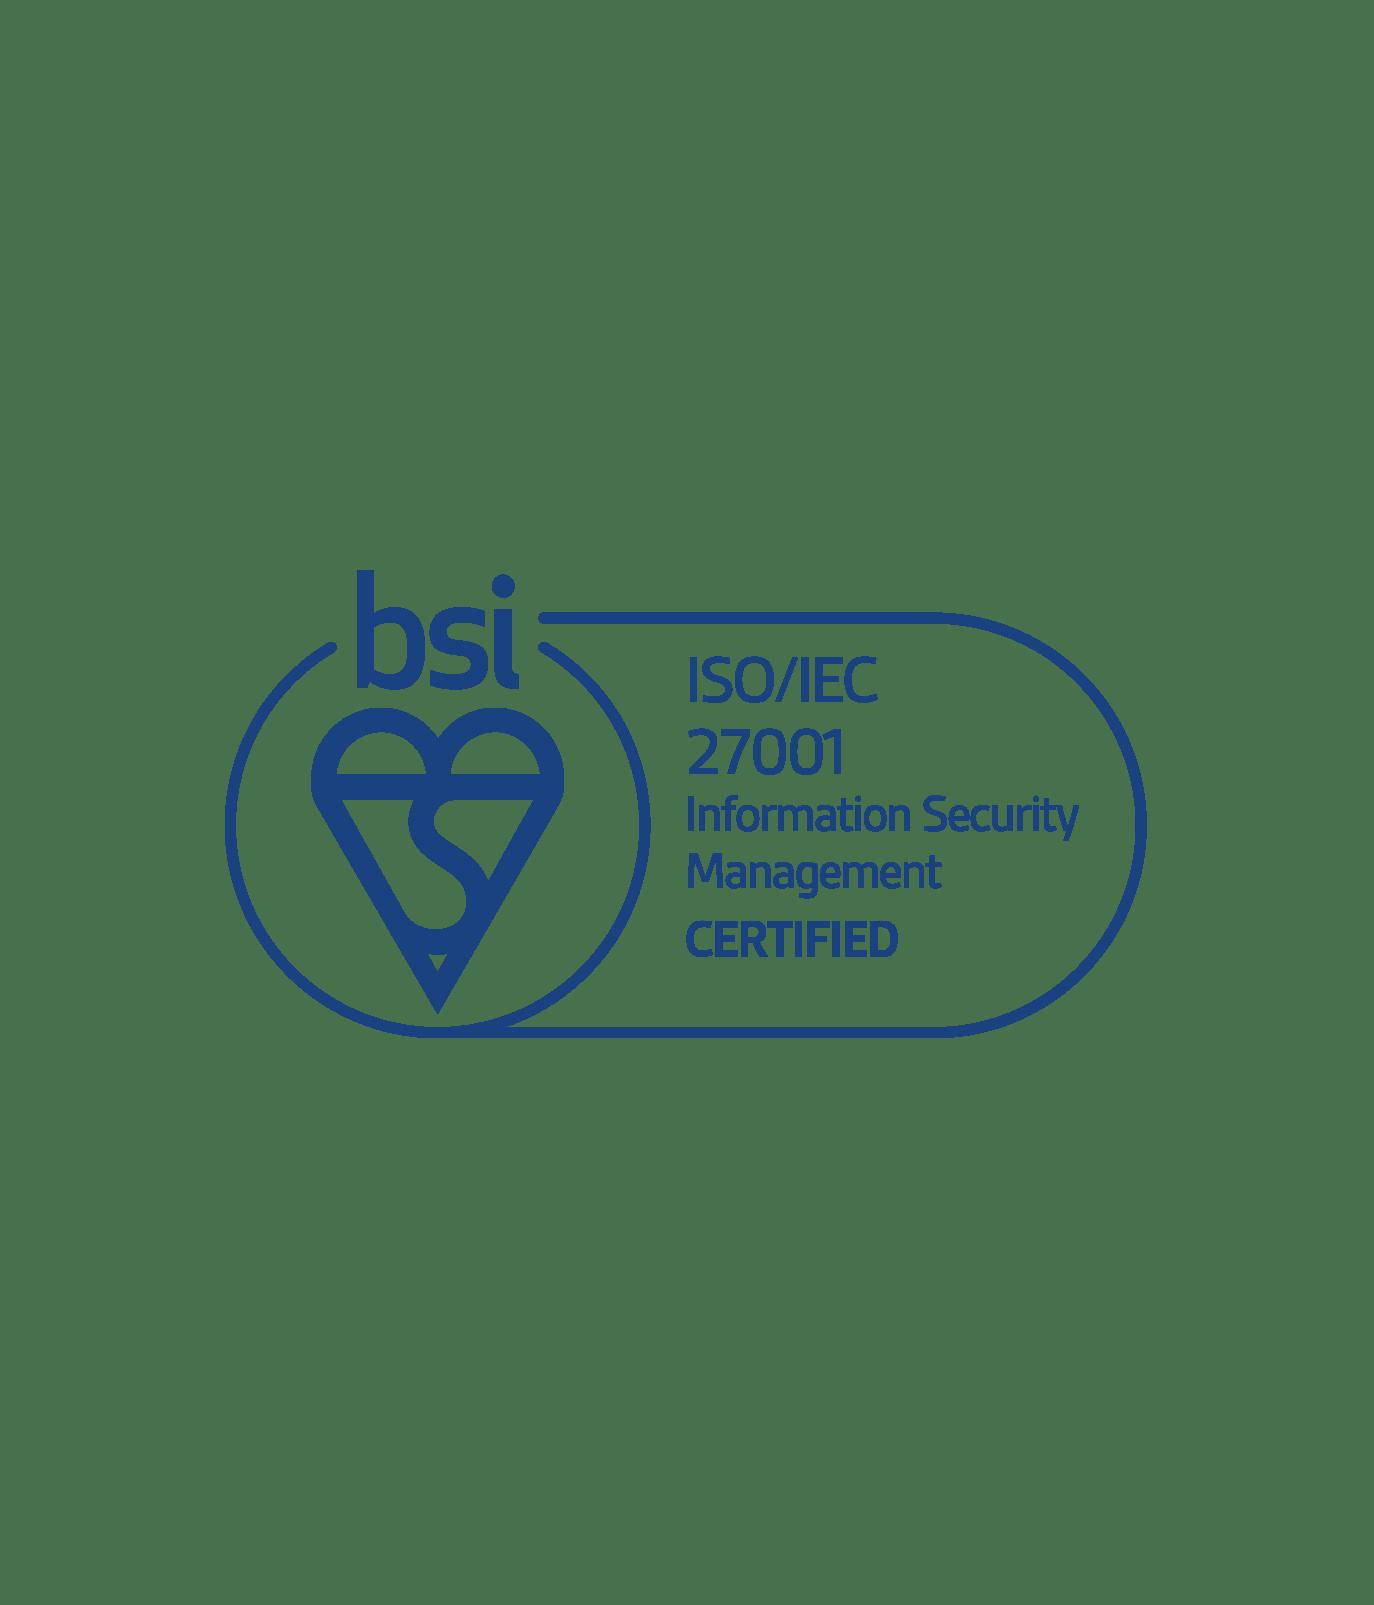 certification 27001